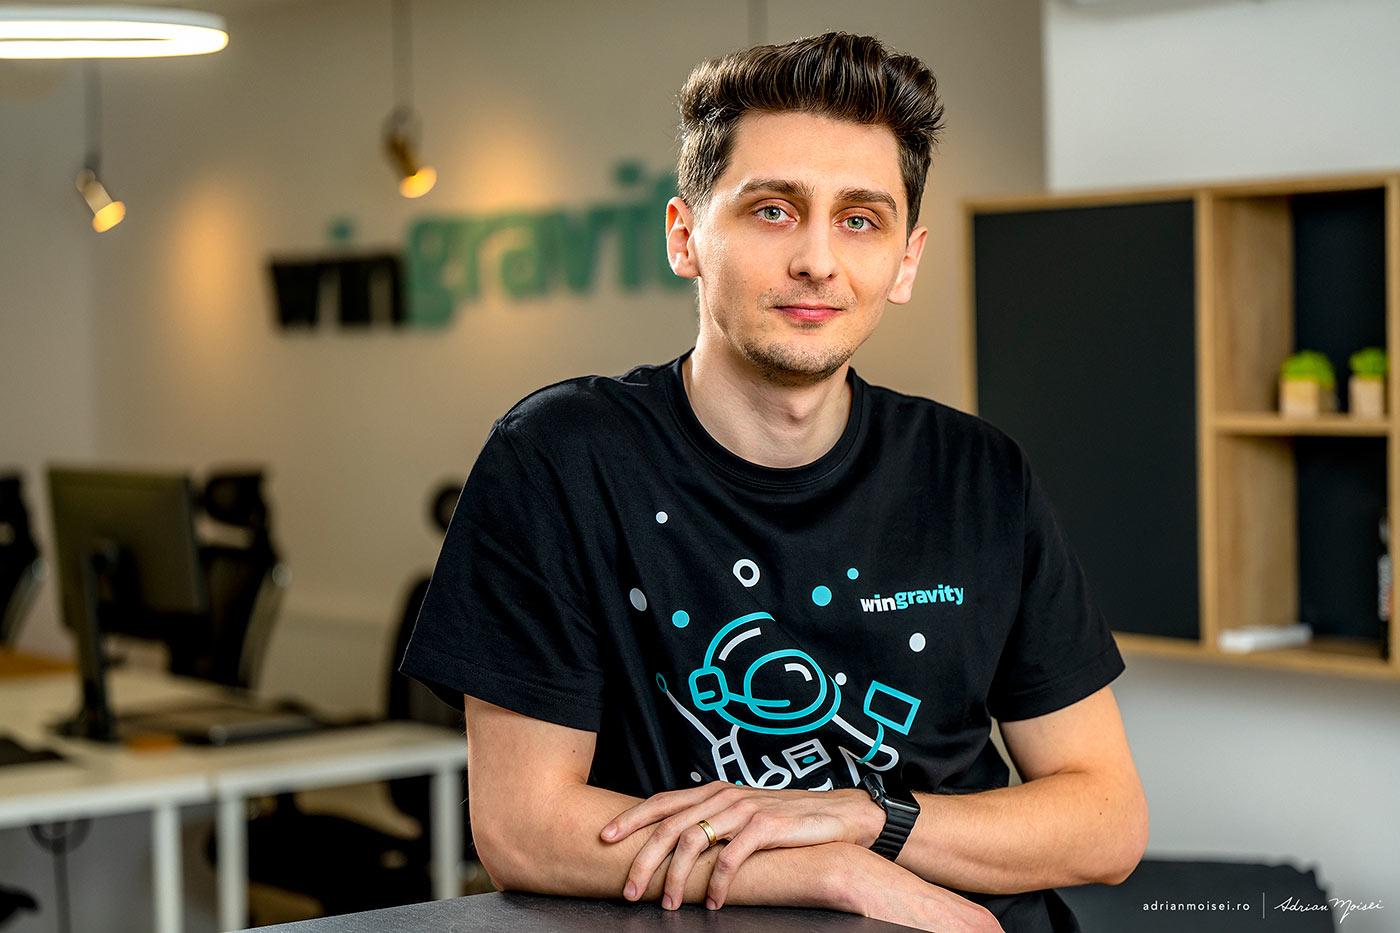 Daniel at WinGravity - the international full service product development company